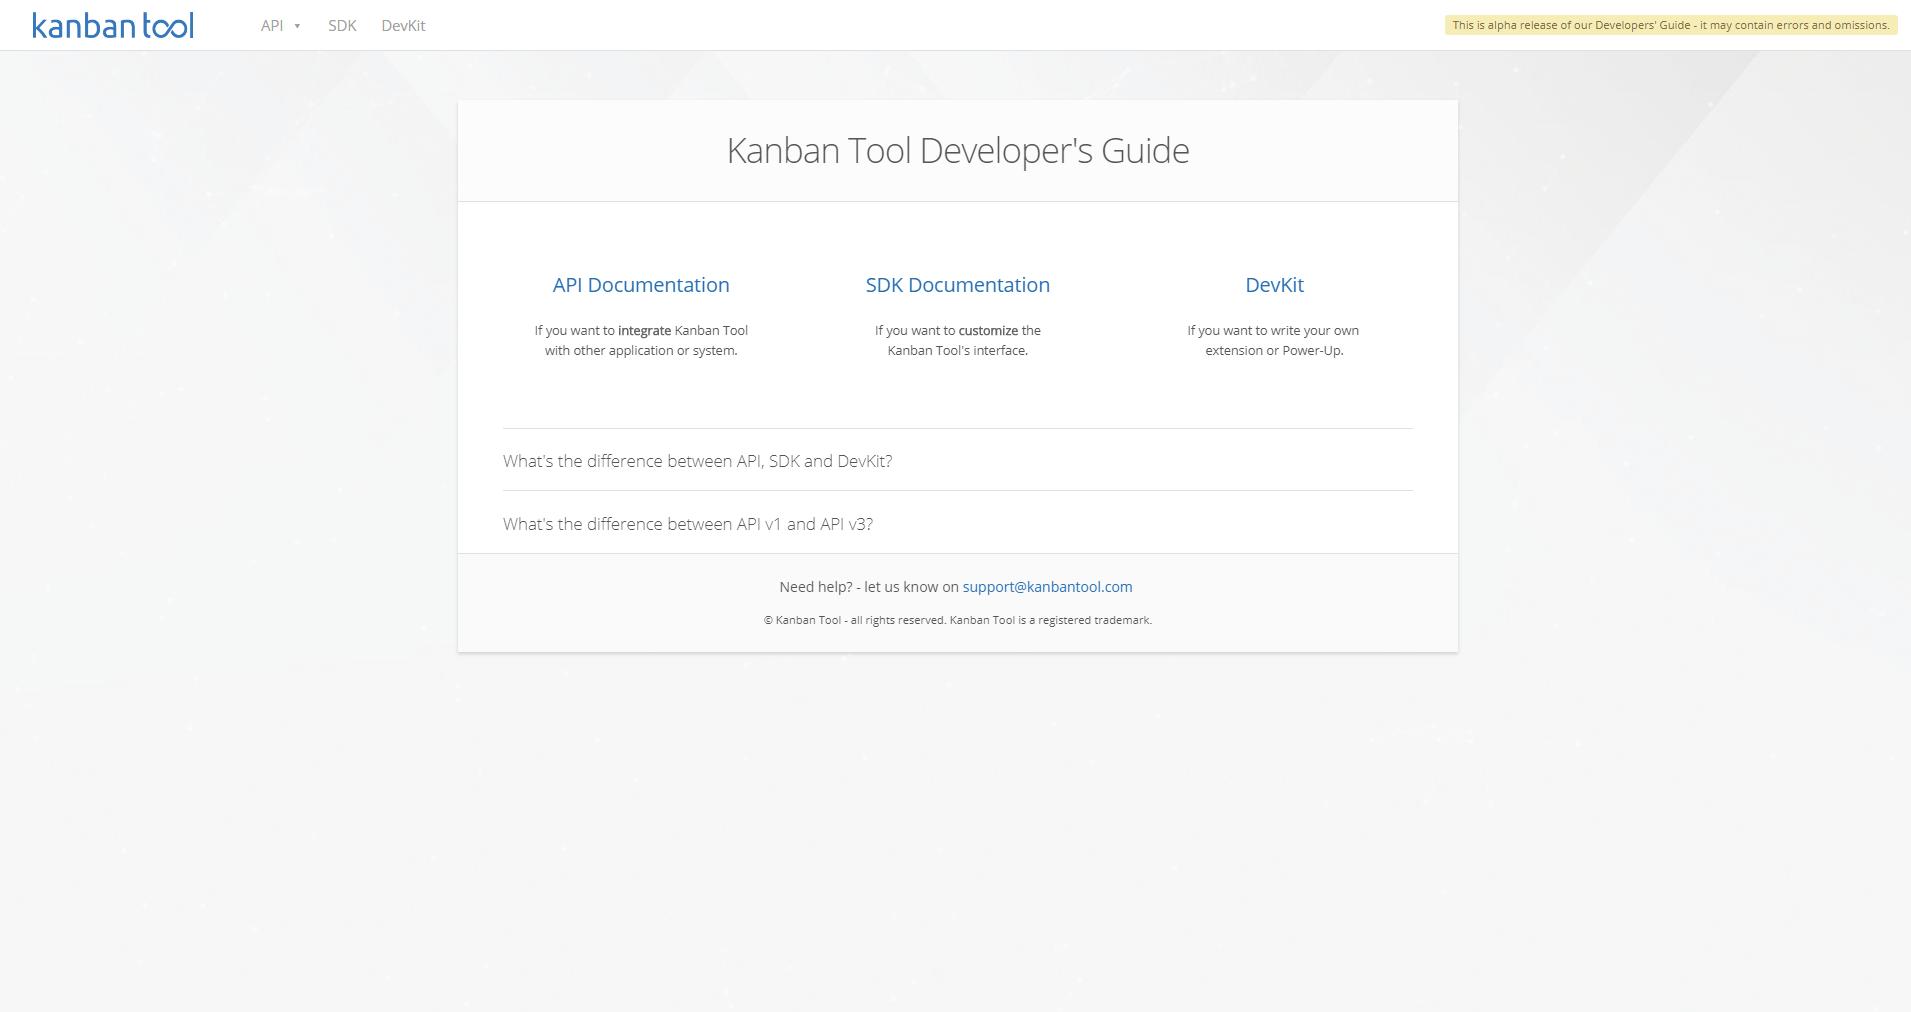 Kanban Tool Developer's Guide